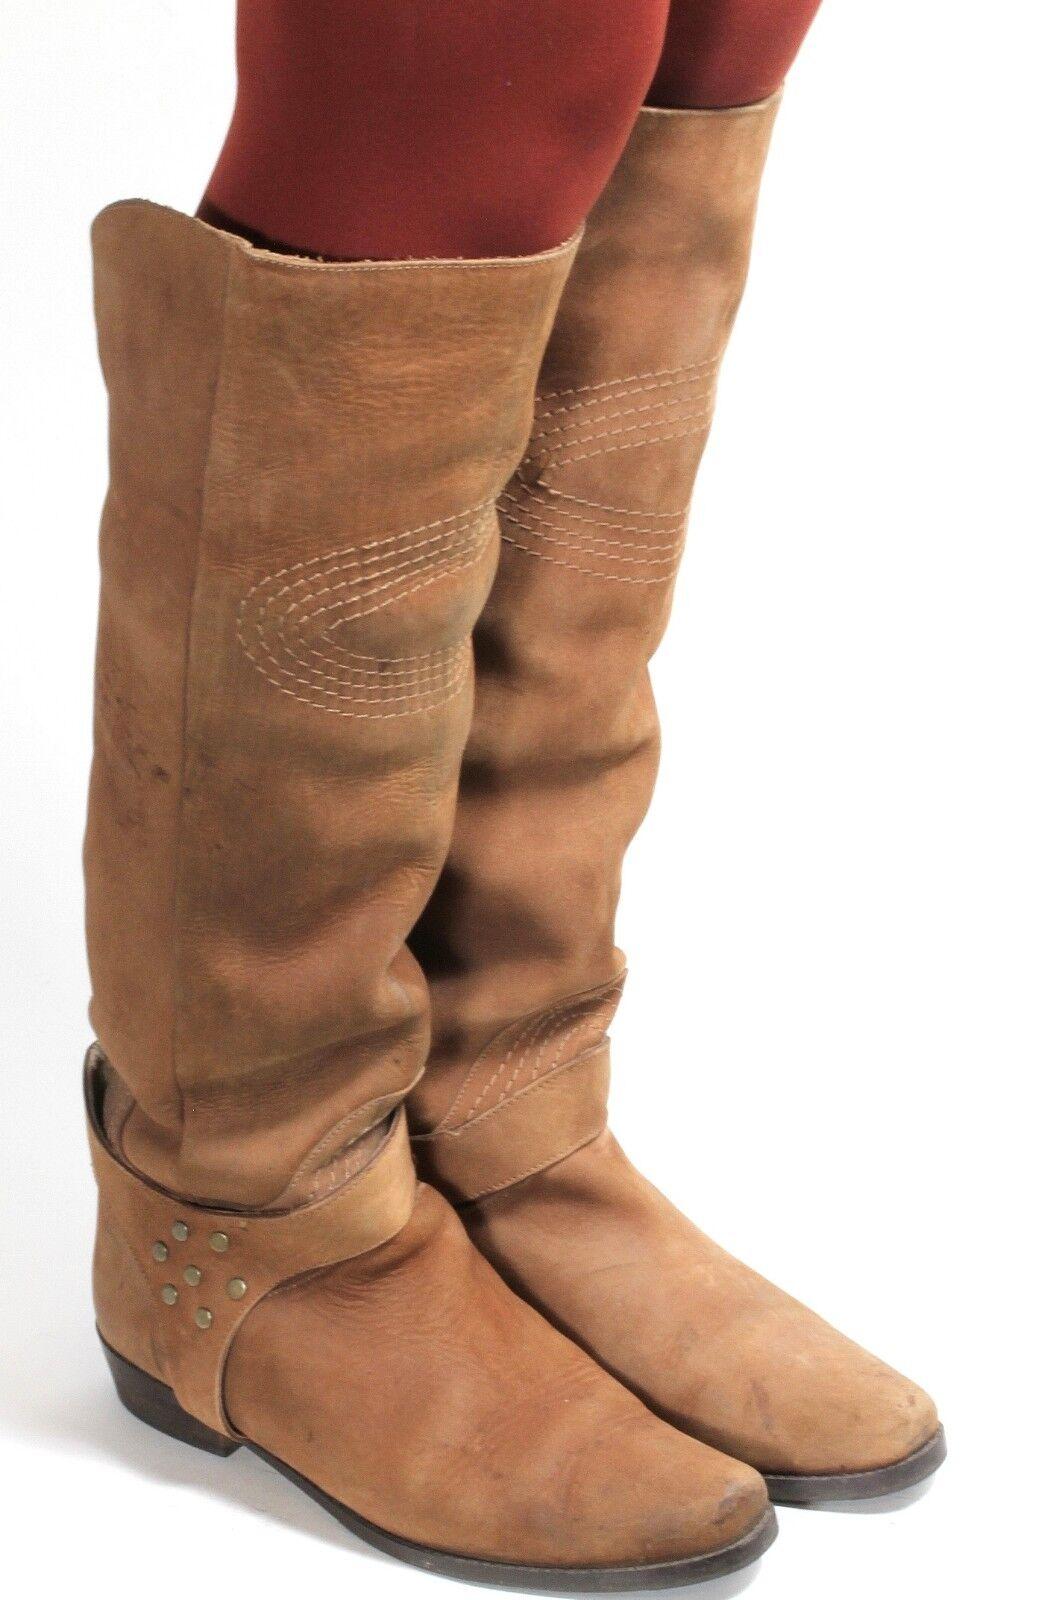 GUESS Damen Schuhe Pumps Gr 37 Schwarz Wildleder Leder Spitz Elegant Np 105 Neu